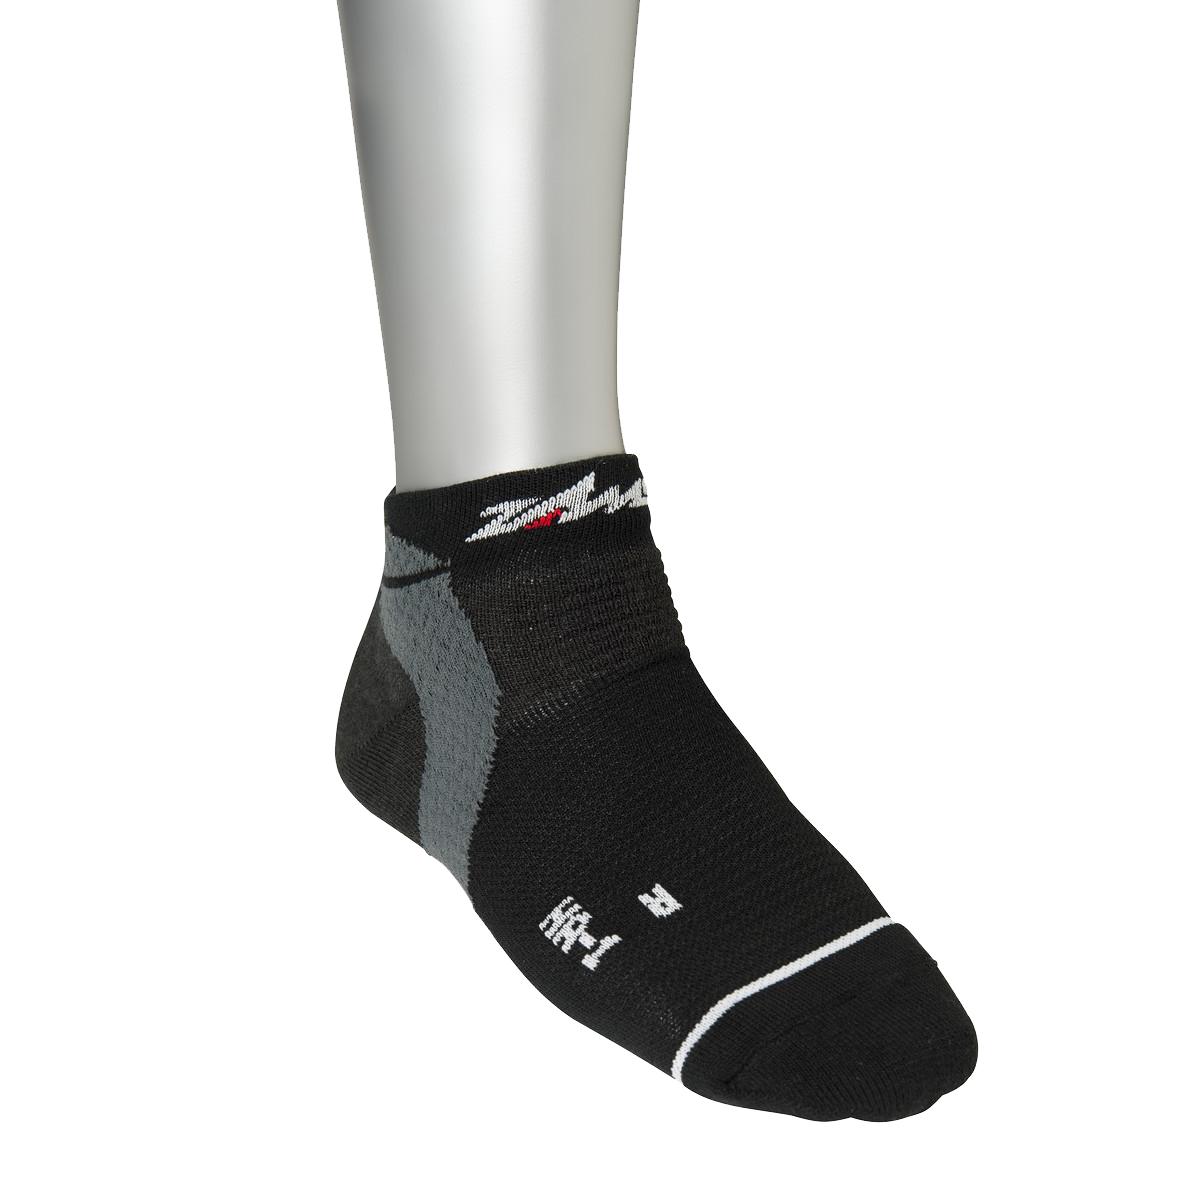 Zamst HA-1 Run Support Sokken - Zwart - L